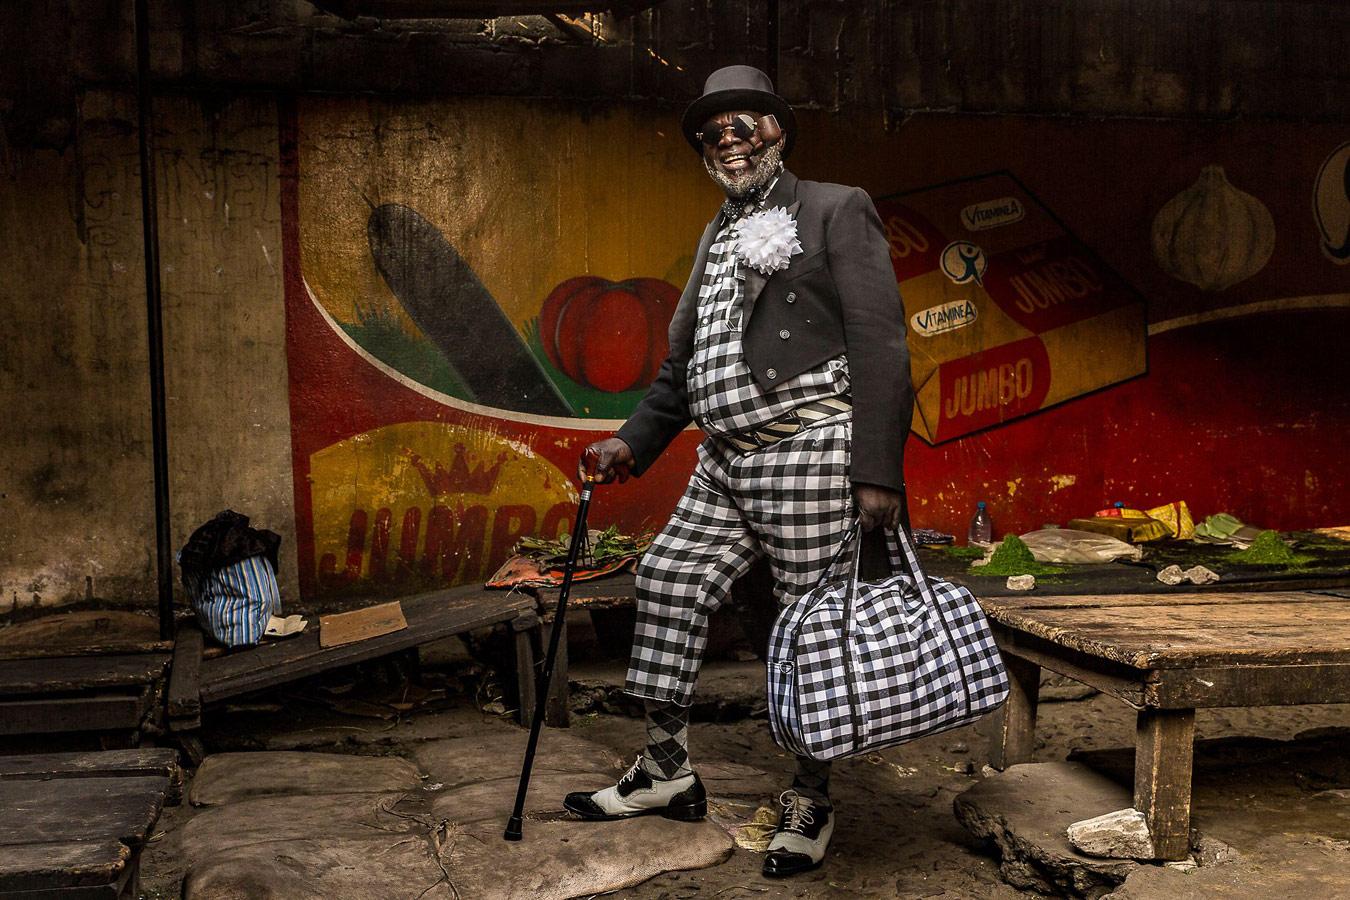 Ямеа, © Тарик Заиди, Великобритания, 2 место, Фотоконкурс Siena